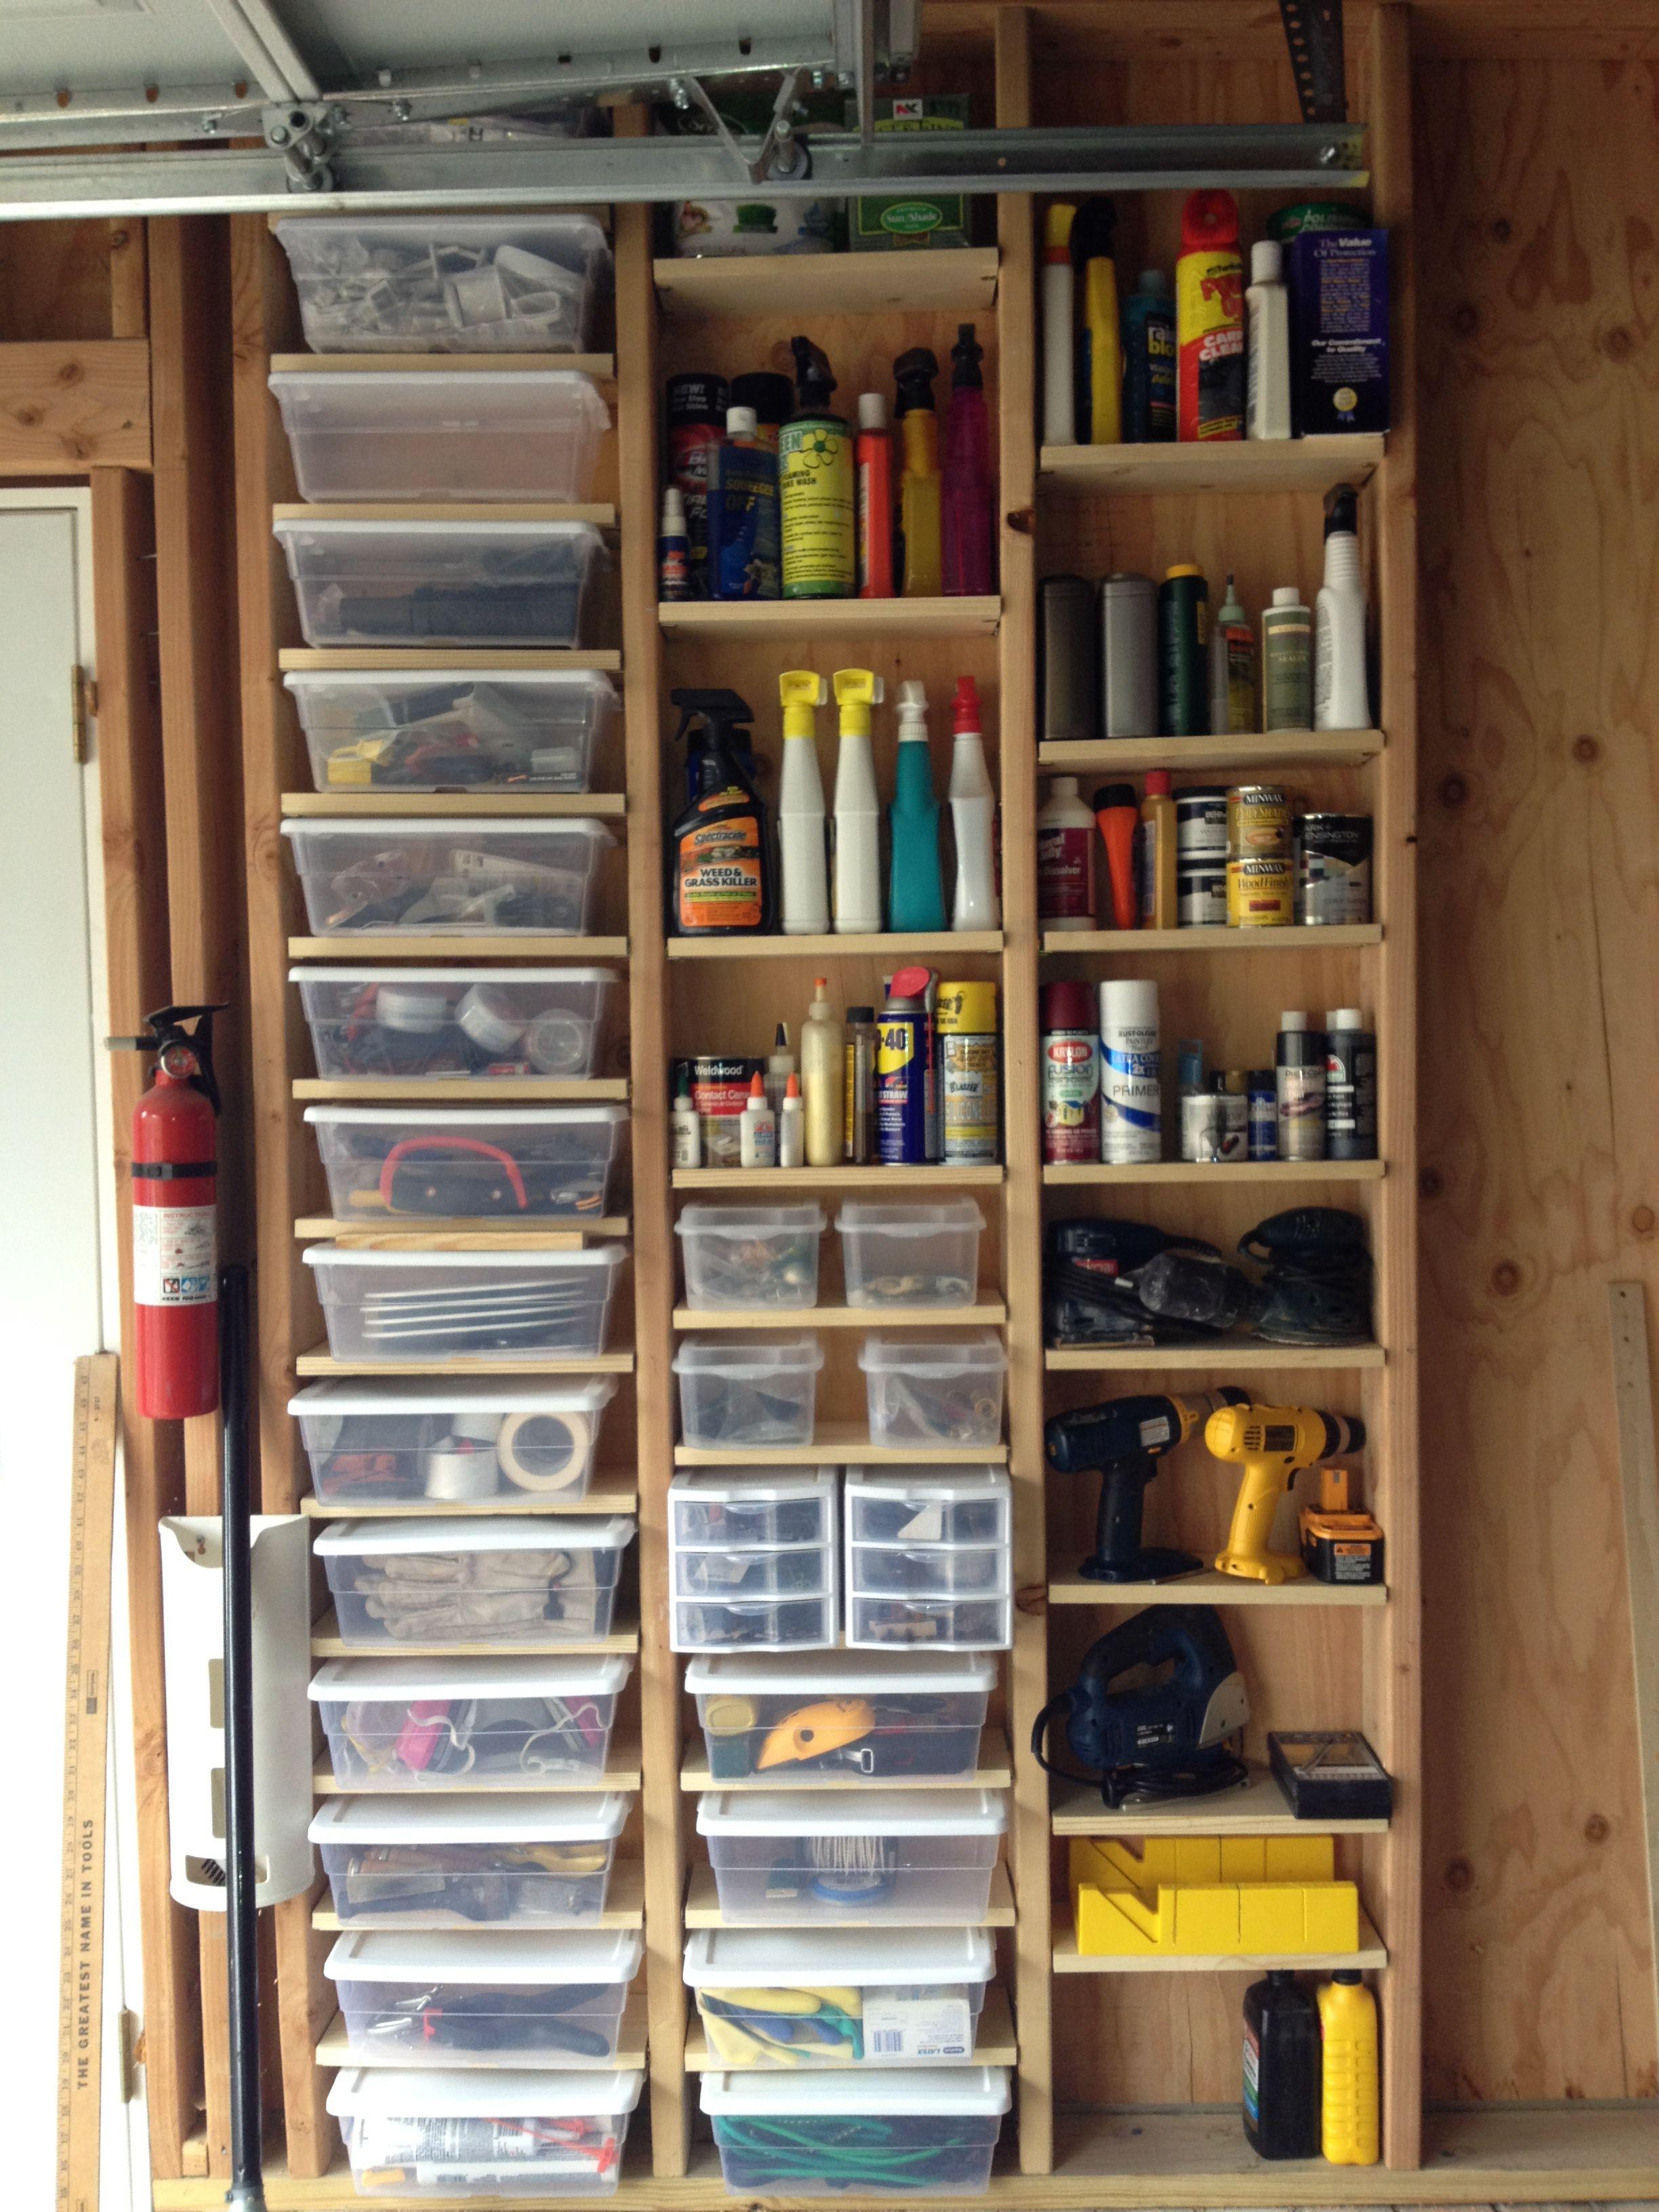 Garage Storage Using Adjustable Shelving In Space Between